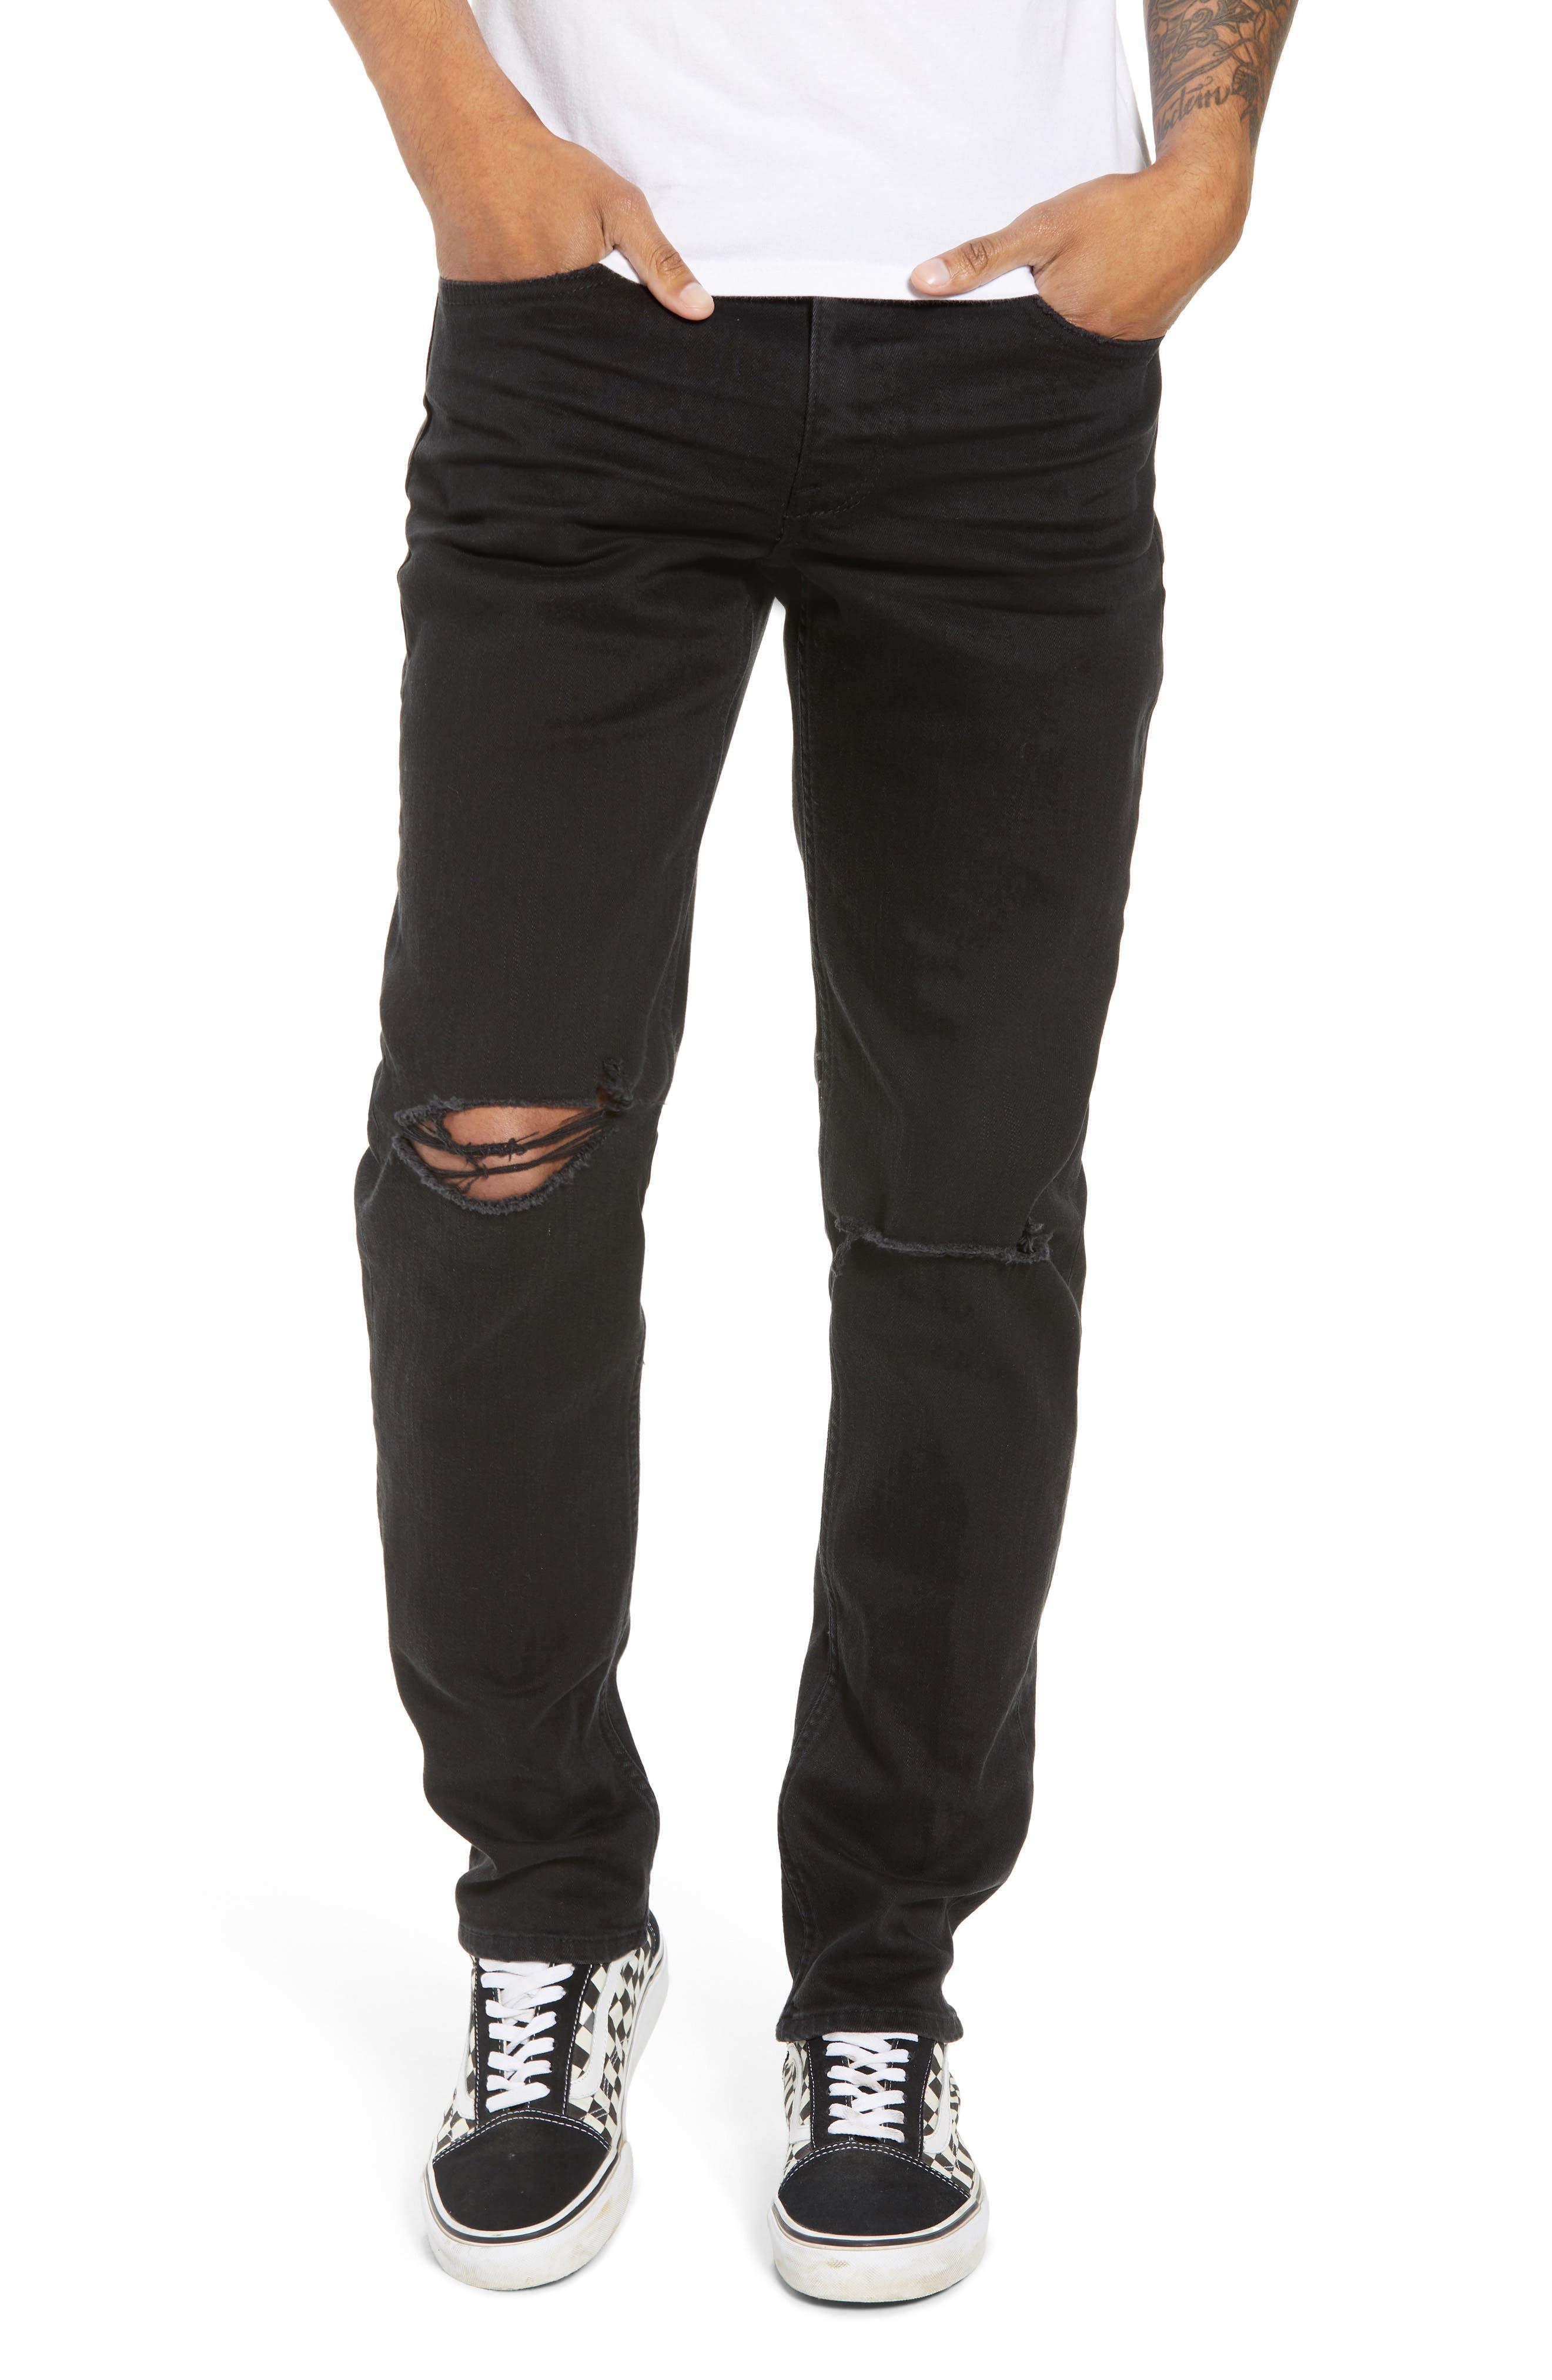 Ripped Skinny Jeans,                             Main thumbnail 1, color,                             BLACK STONE WASH